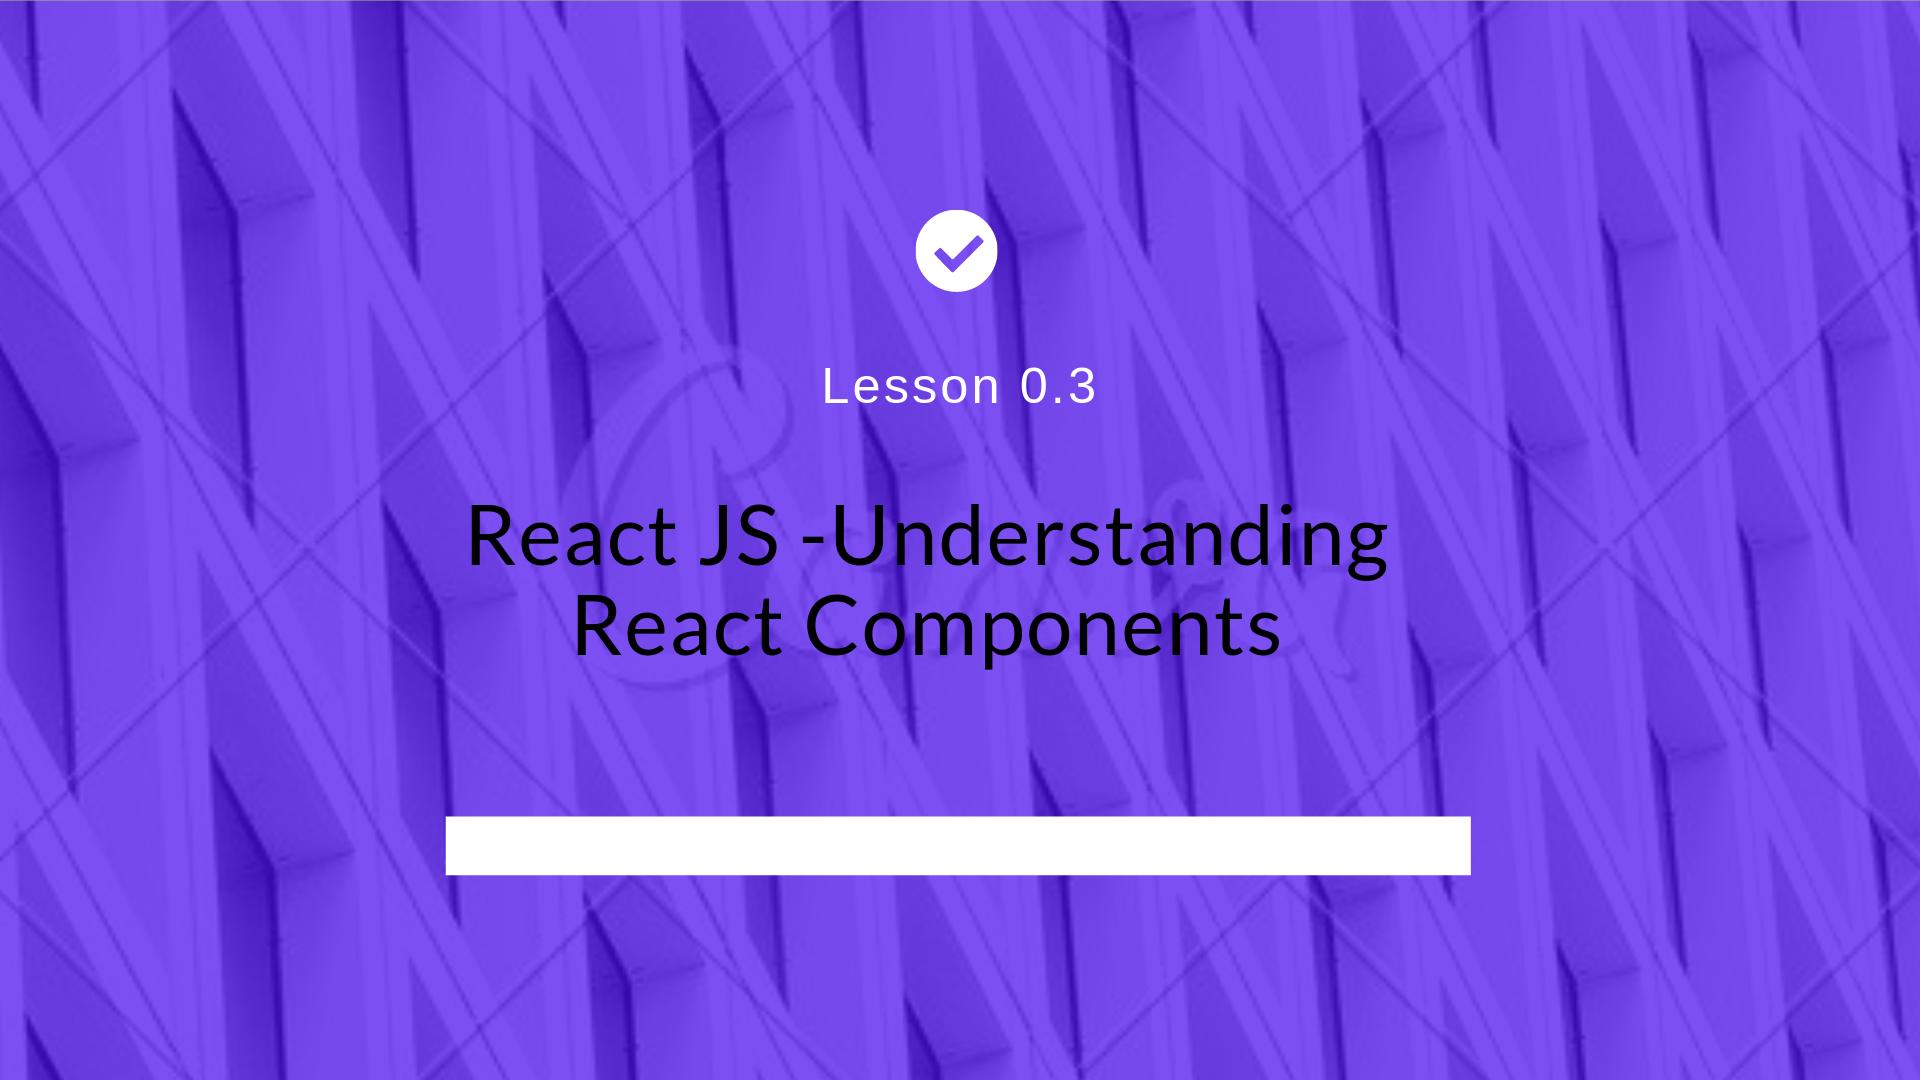 React JS -Understanding React Components